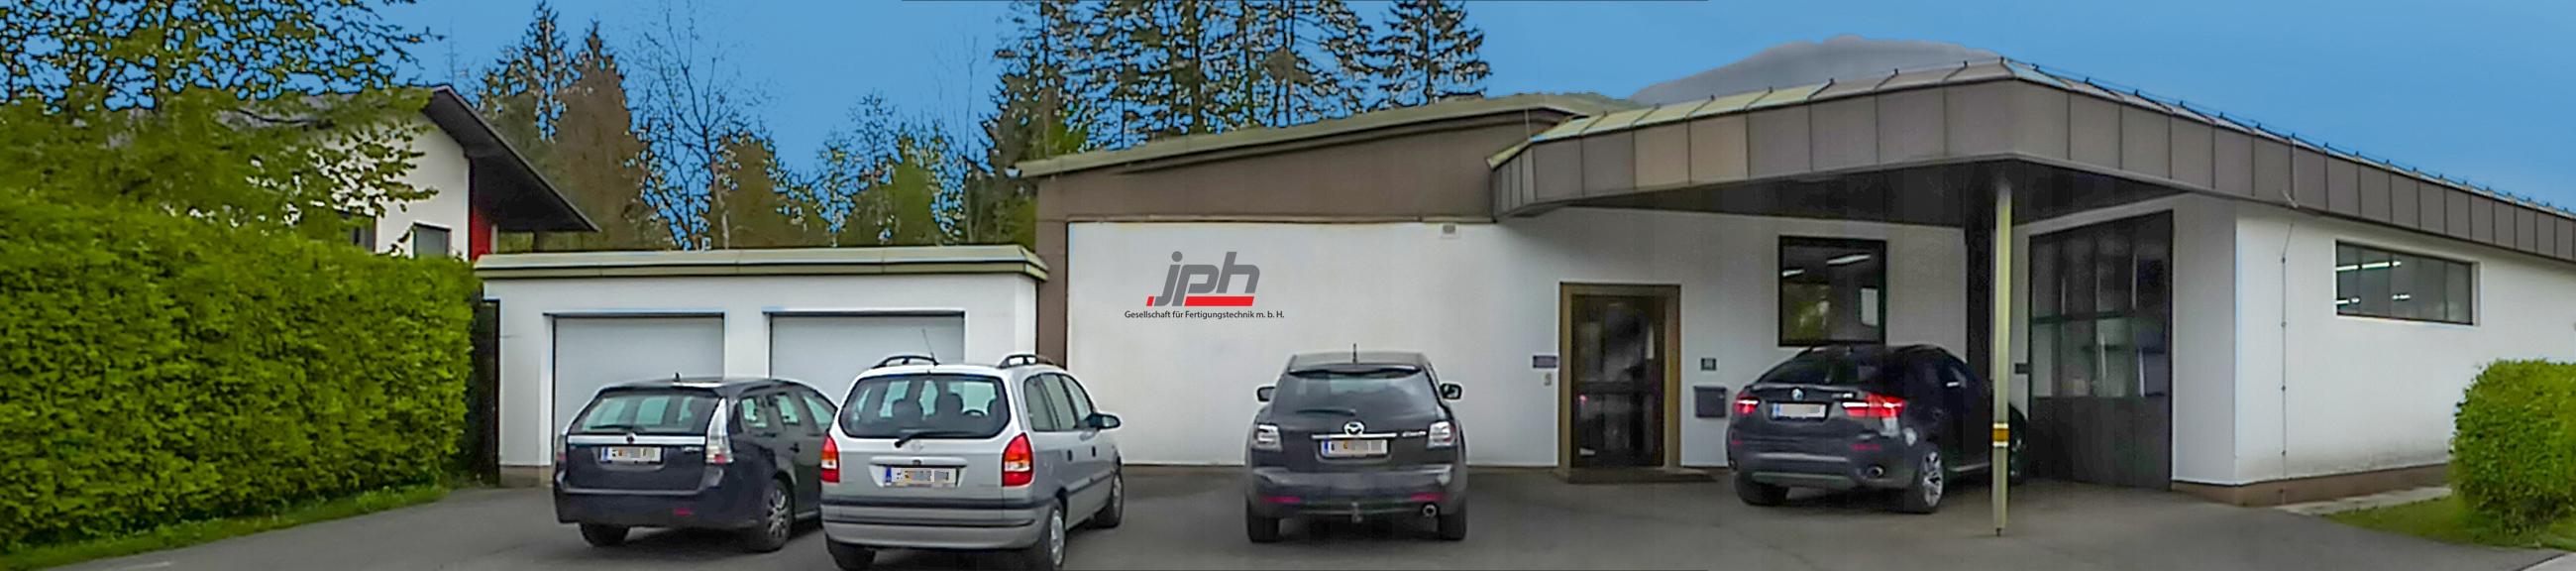 JPH GmbH